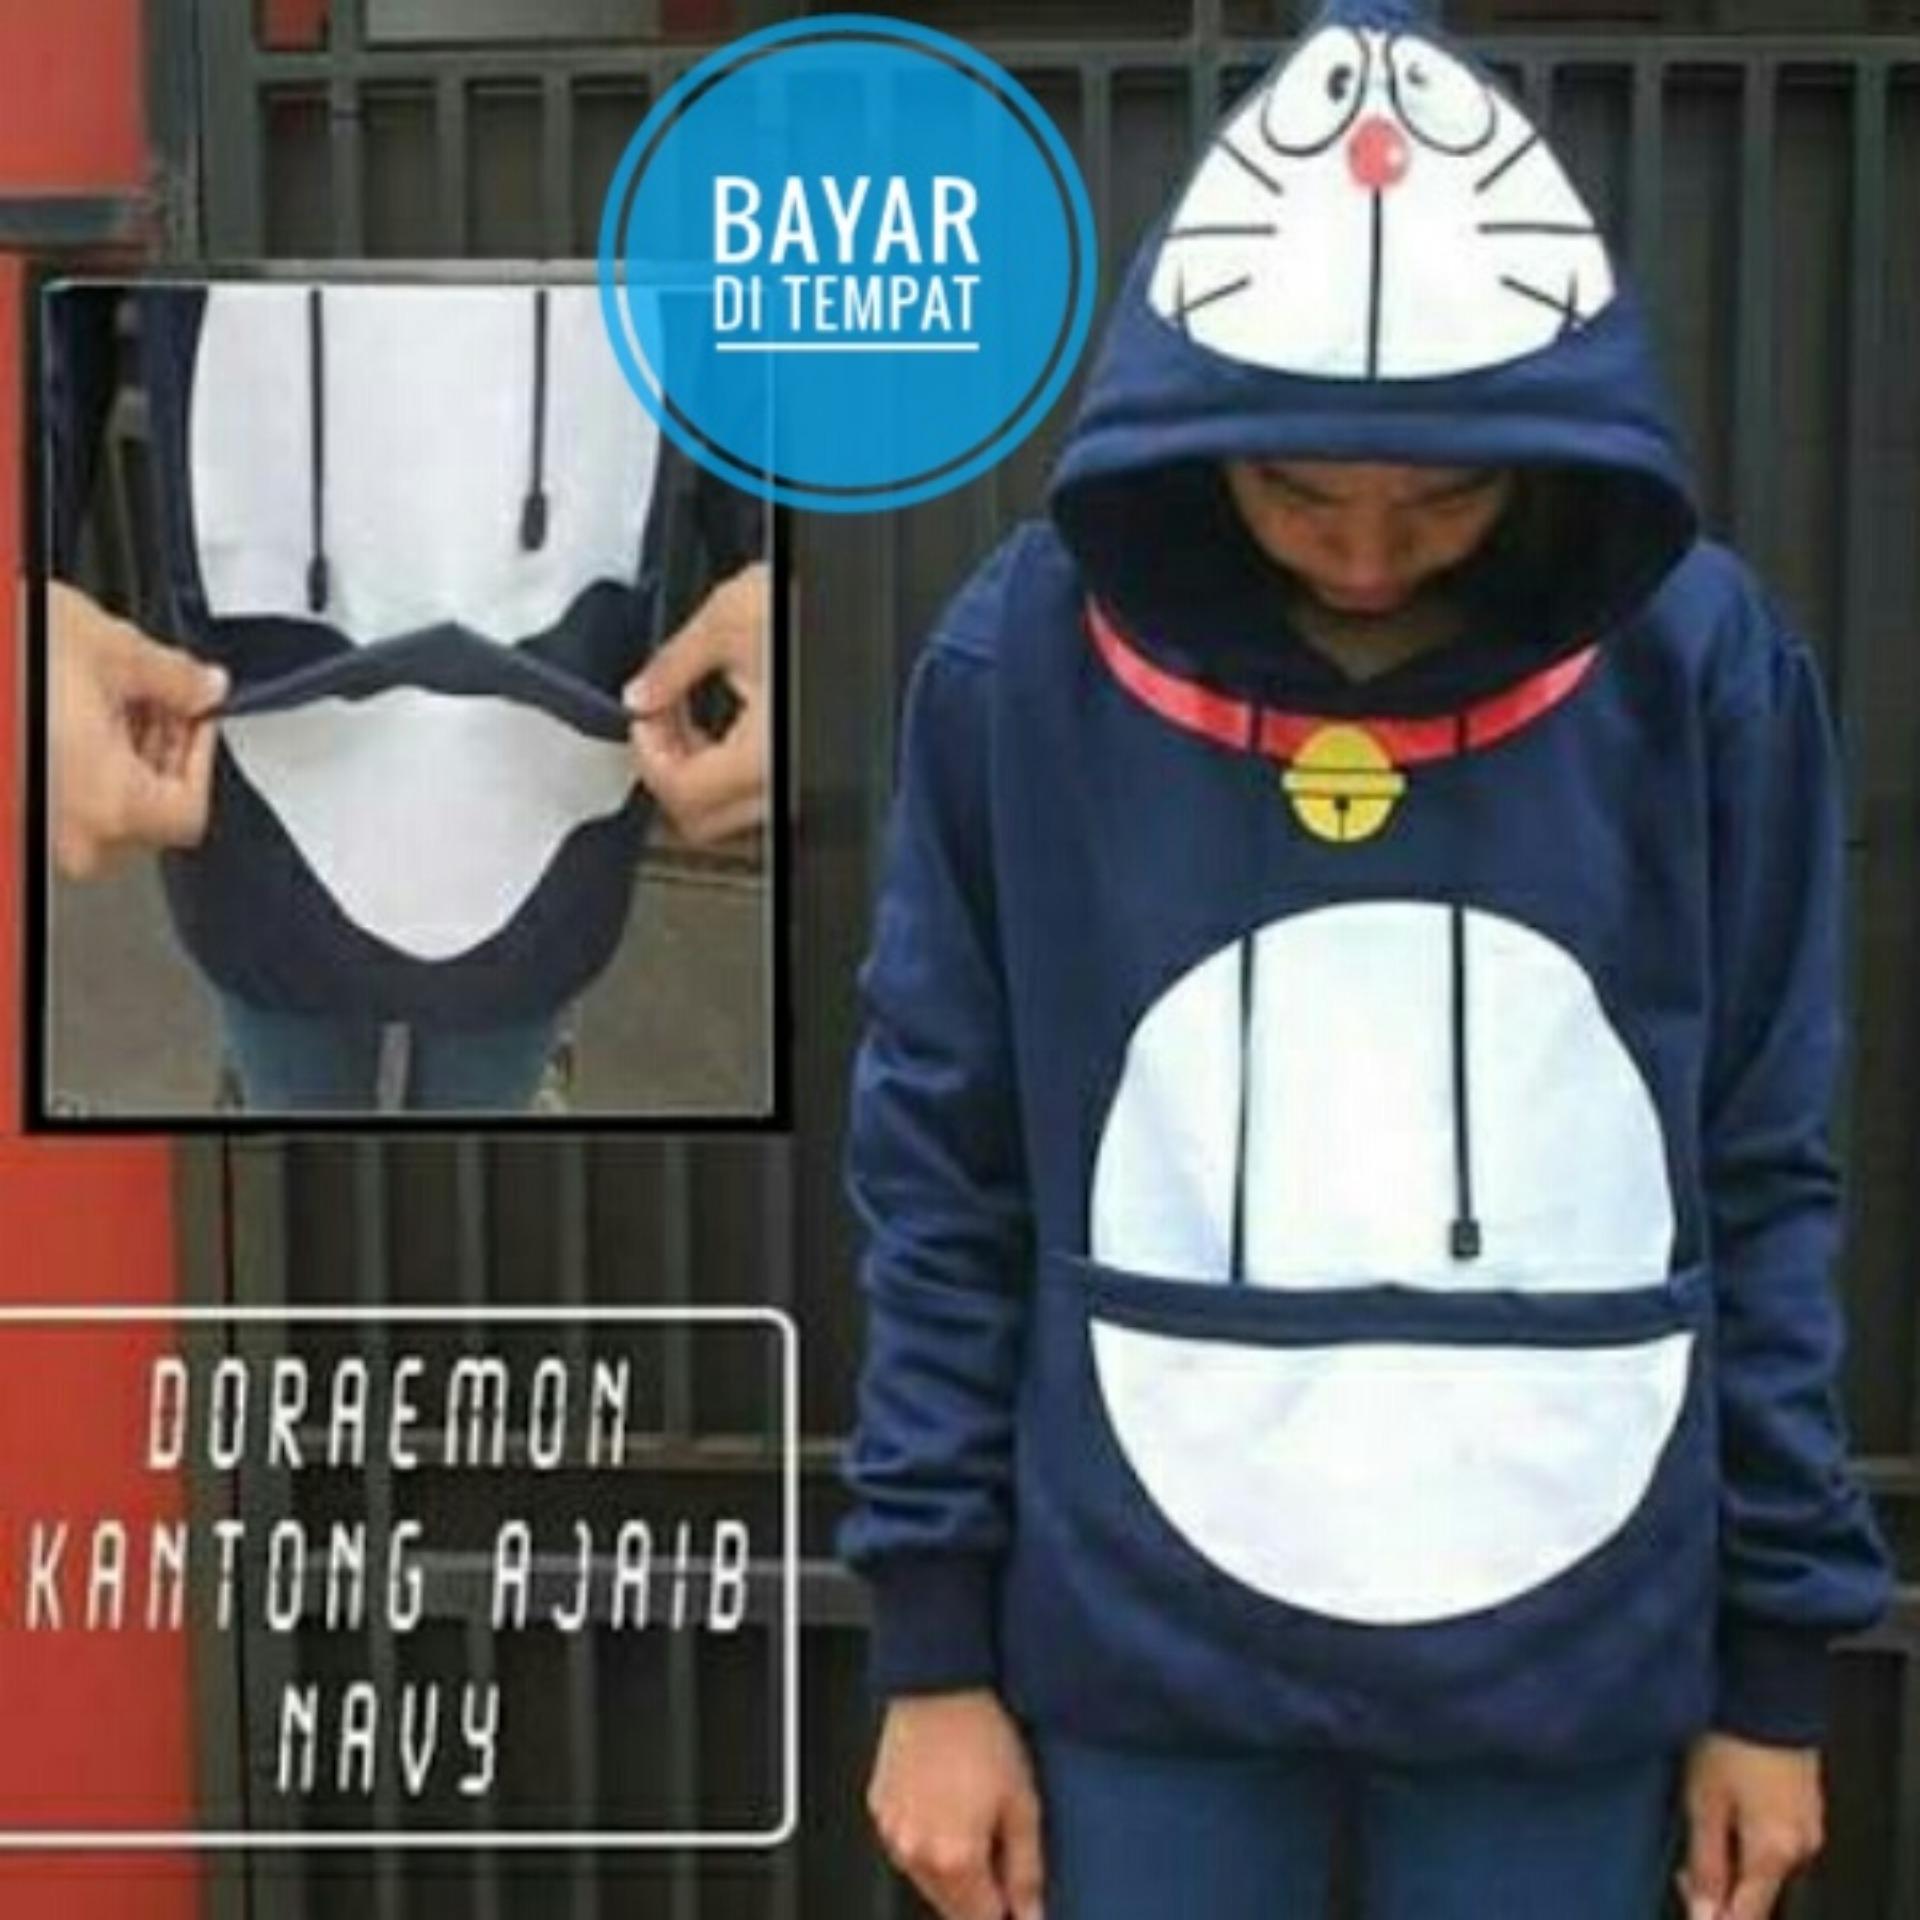 Jaket Doraemon Kantong Ajaib Navy Hoodie Zipper